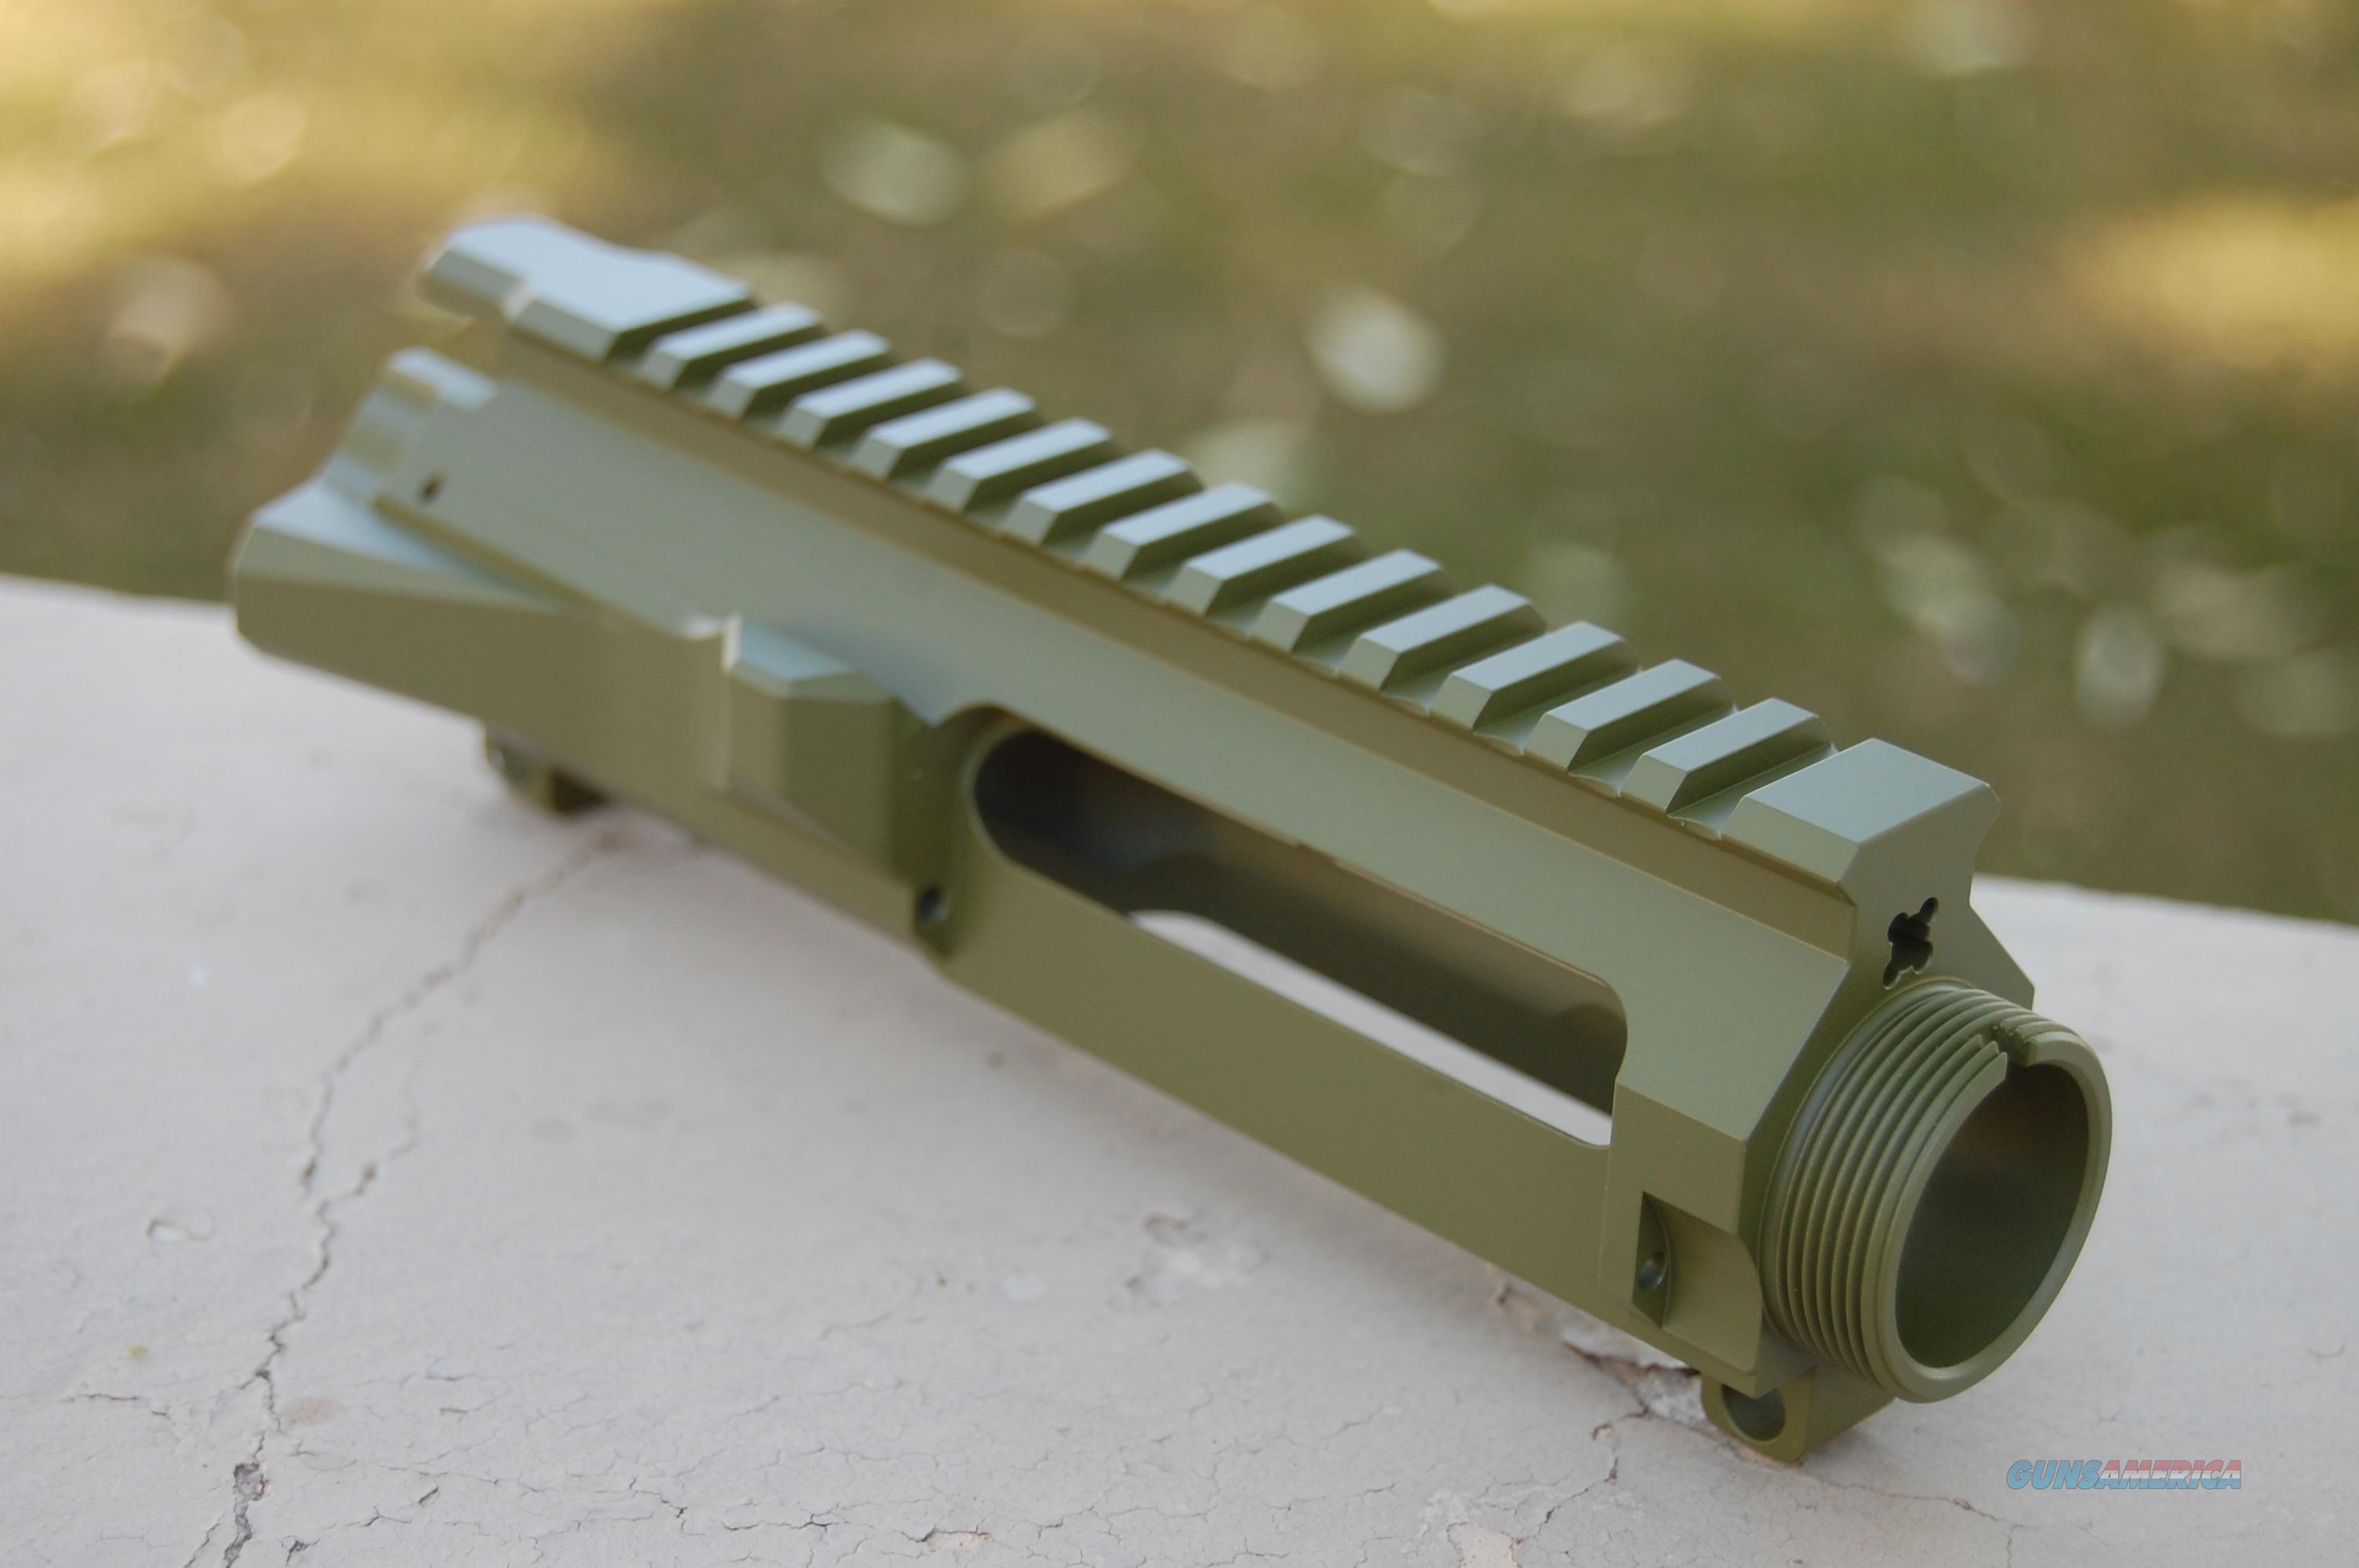 Guntec Billet Stripped AR15 Upper X-Werks Noveske  Non-Guns > Gun Parts > M16-AR15 > Upper Only